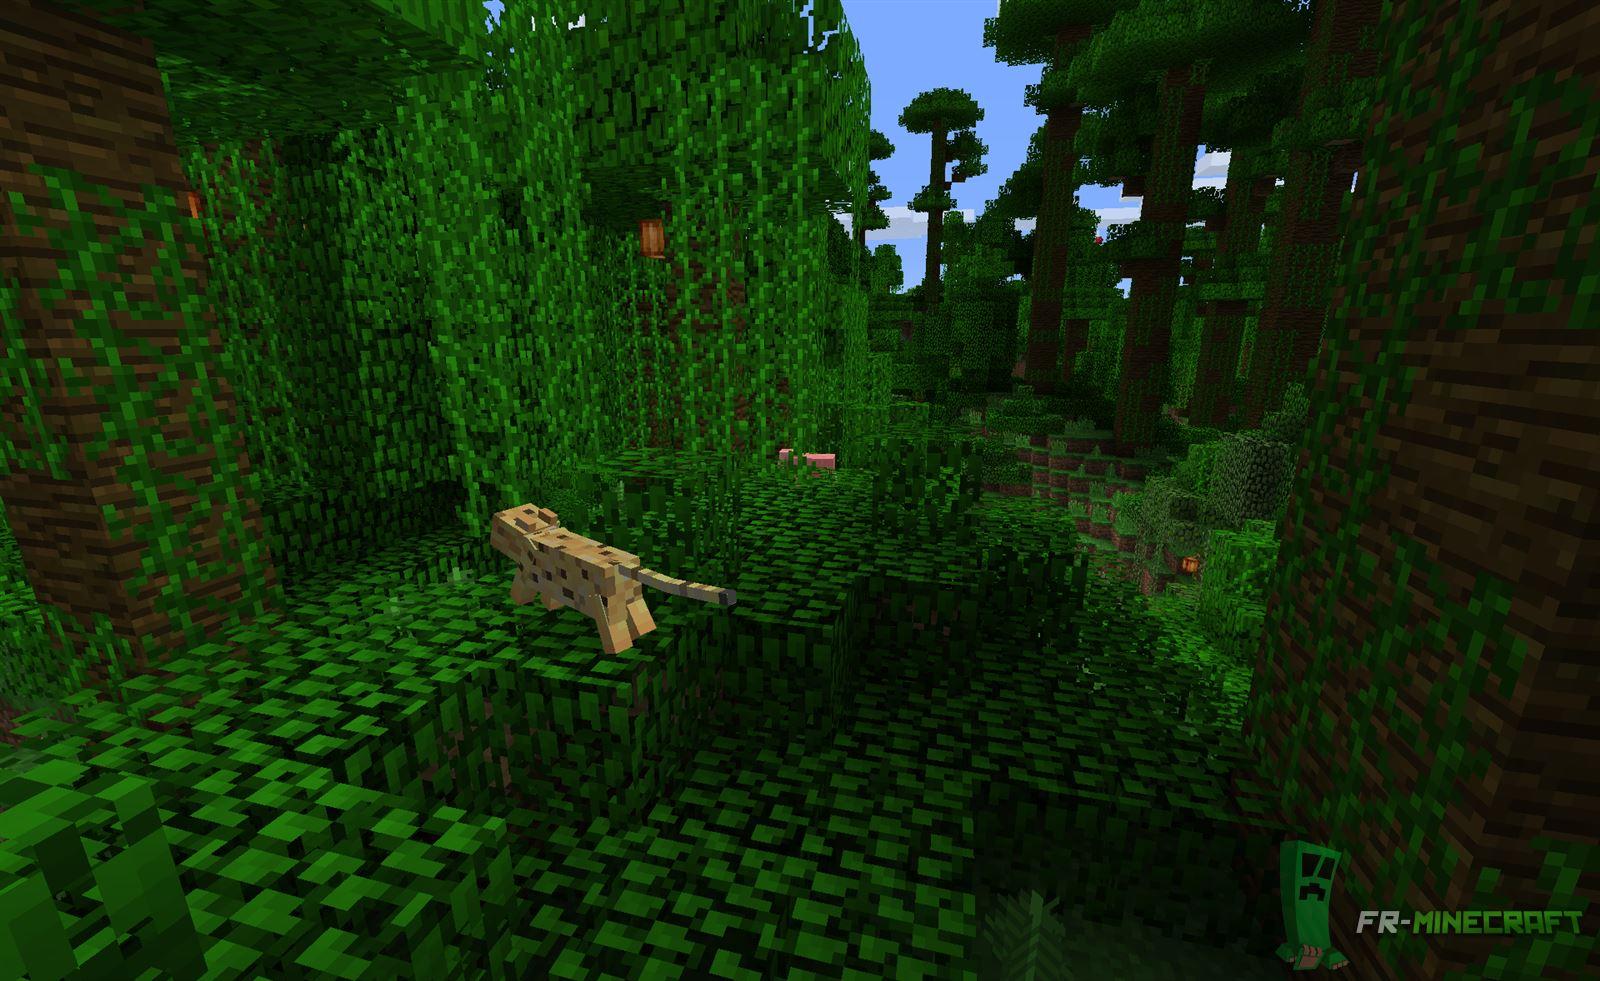 minecraft biome jungle